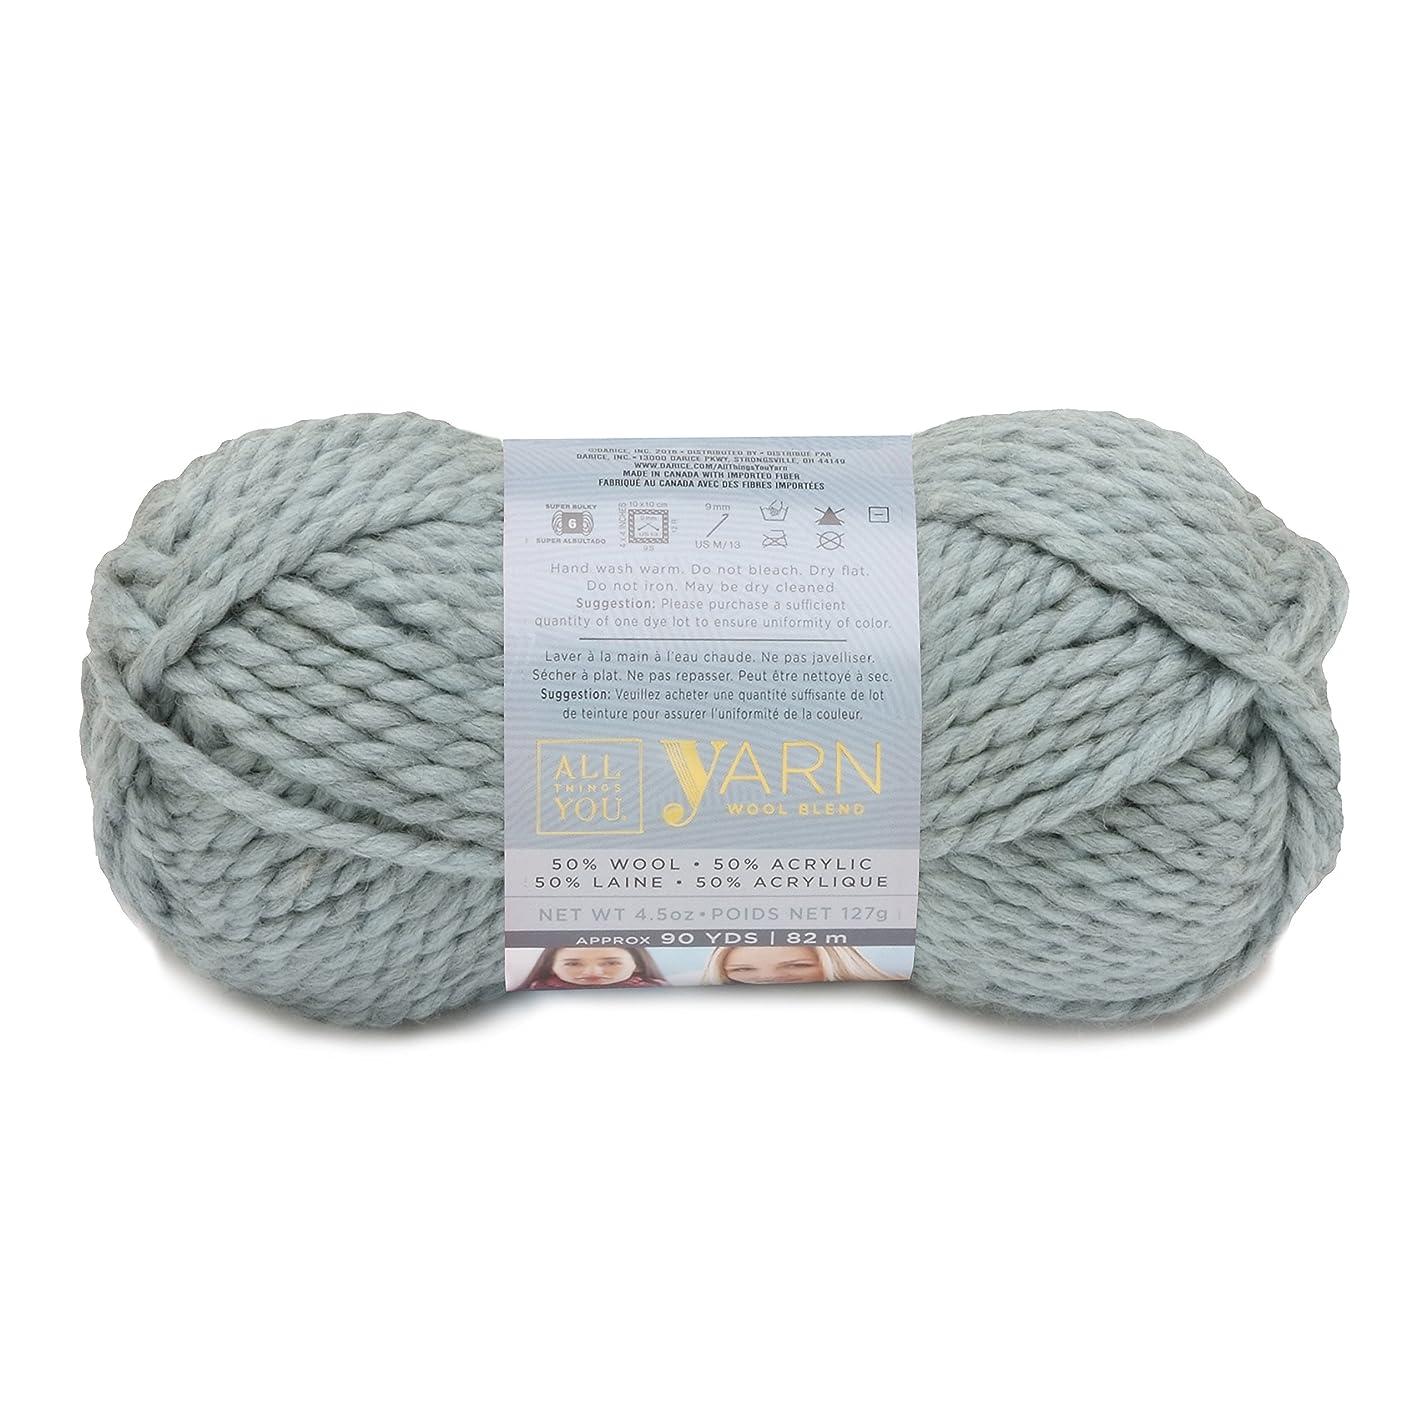 Darice All Things You, Wool and Acylic Blend Yarn, Stone